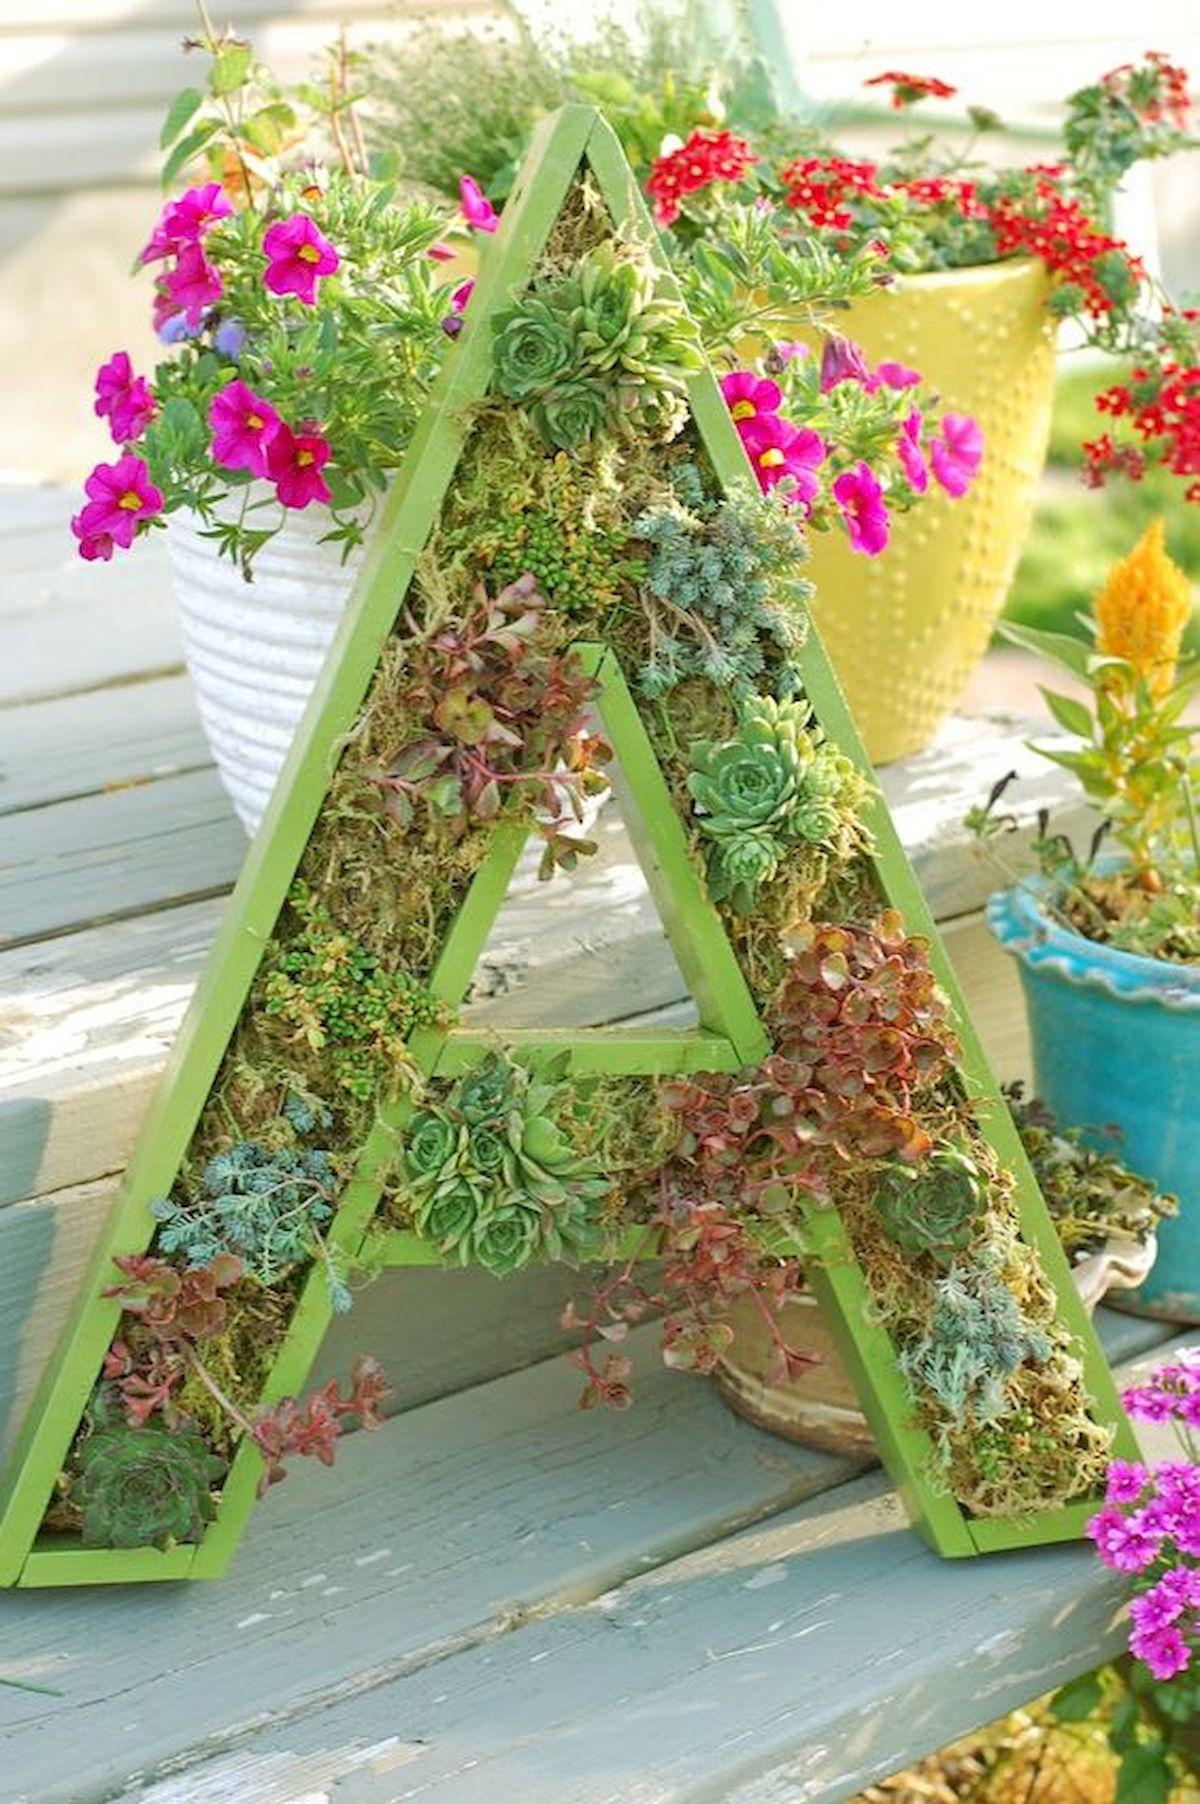 20 Fantastic DIY Planter Ideas for Your Front Porch (3)